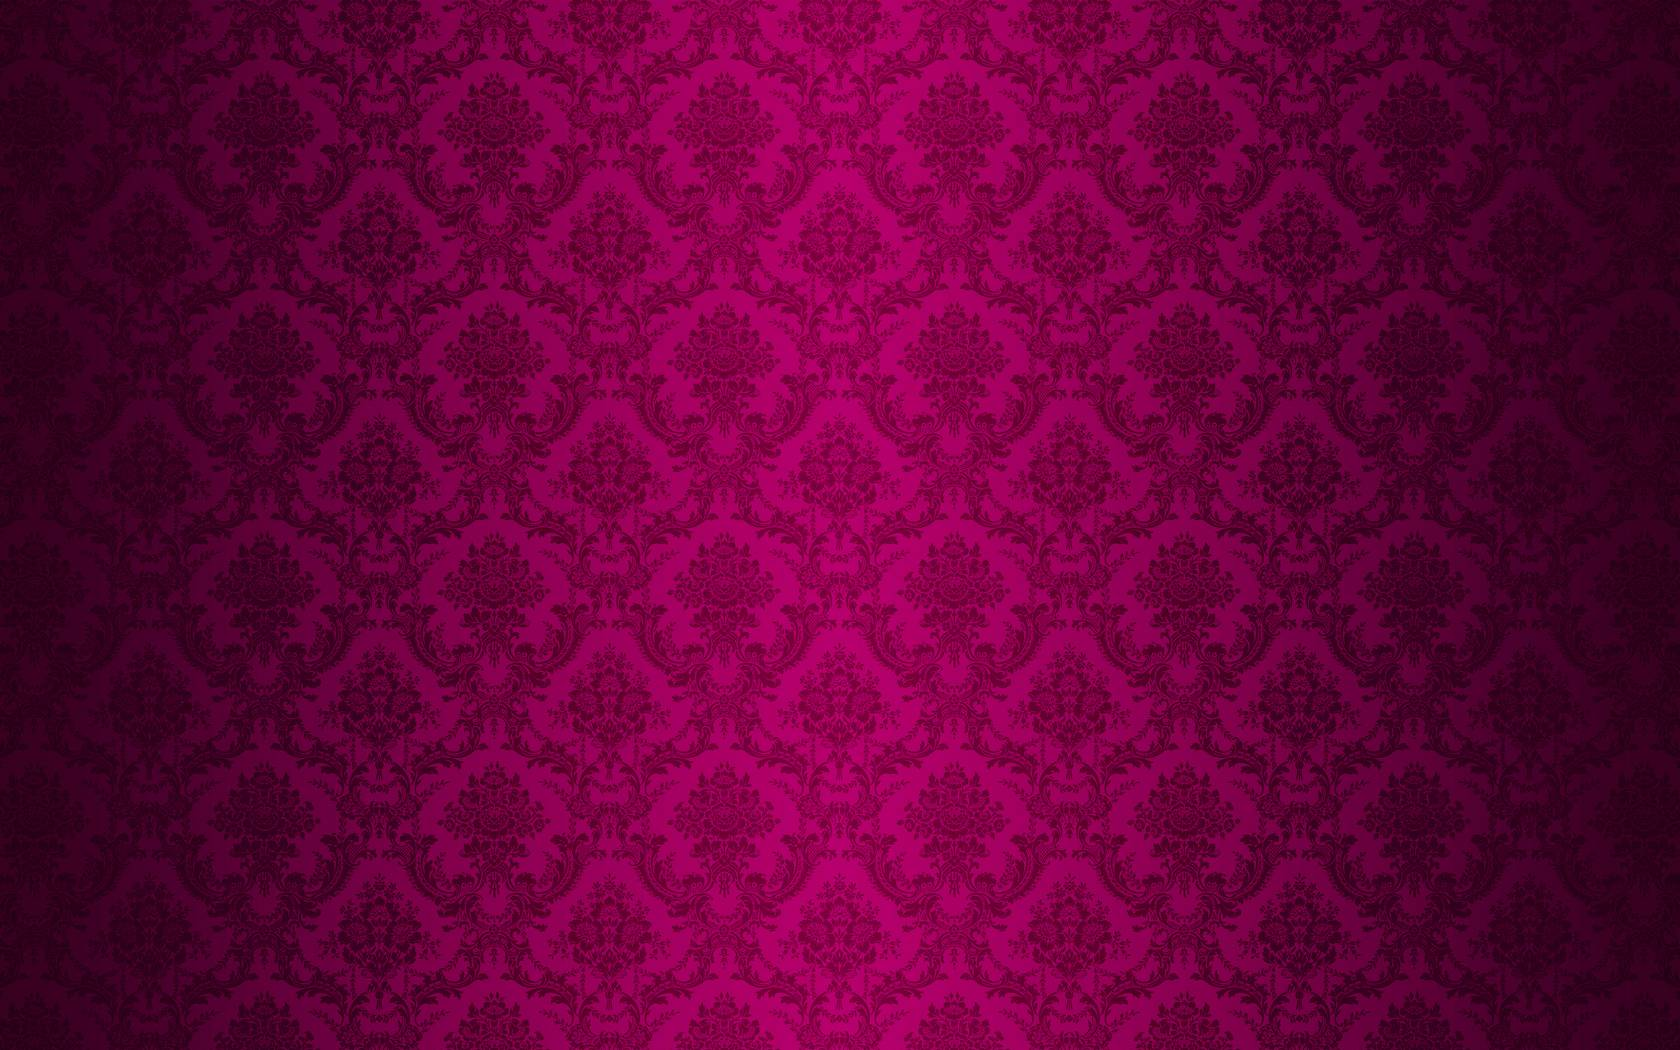 Wallpapers For Purple Damask Desktop Wallpaper